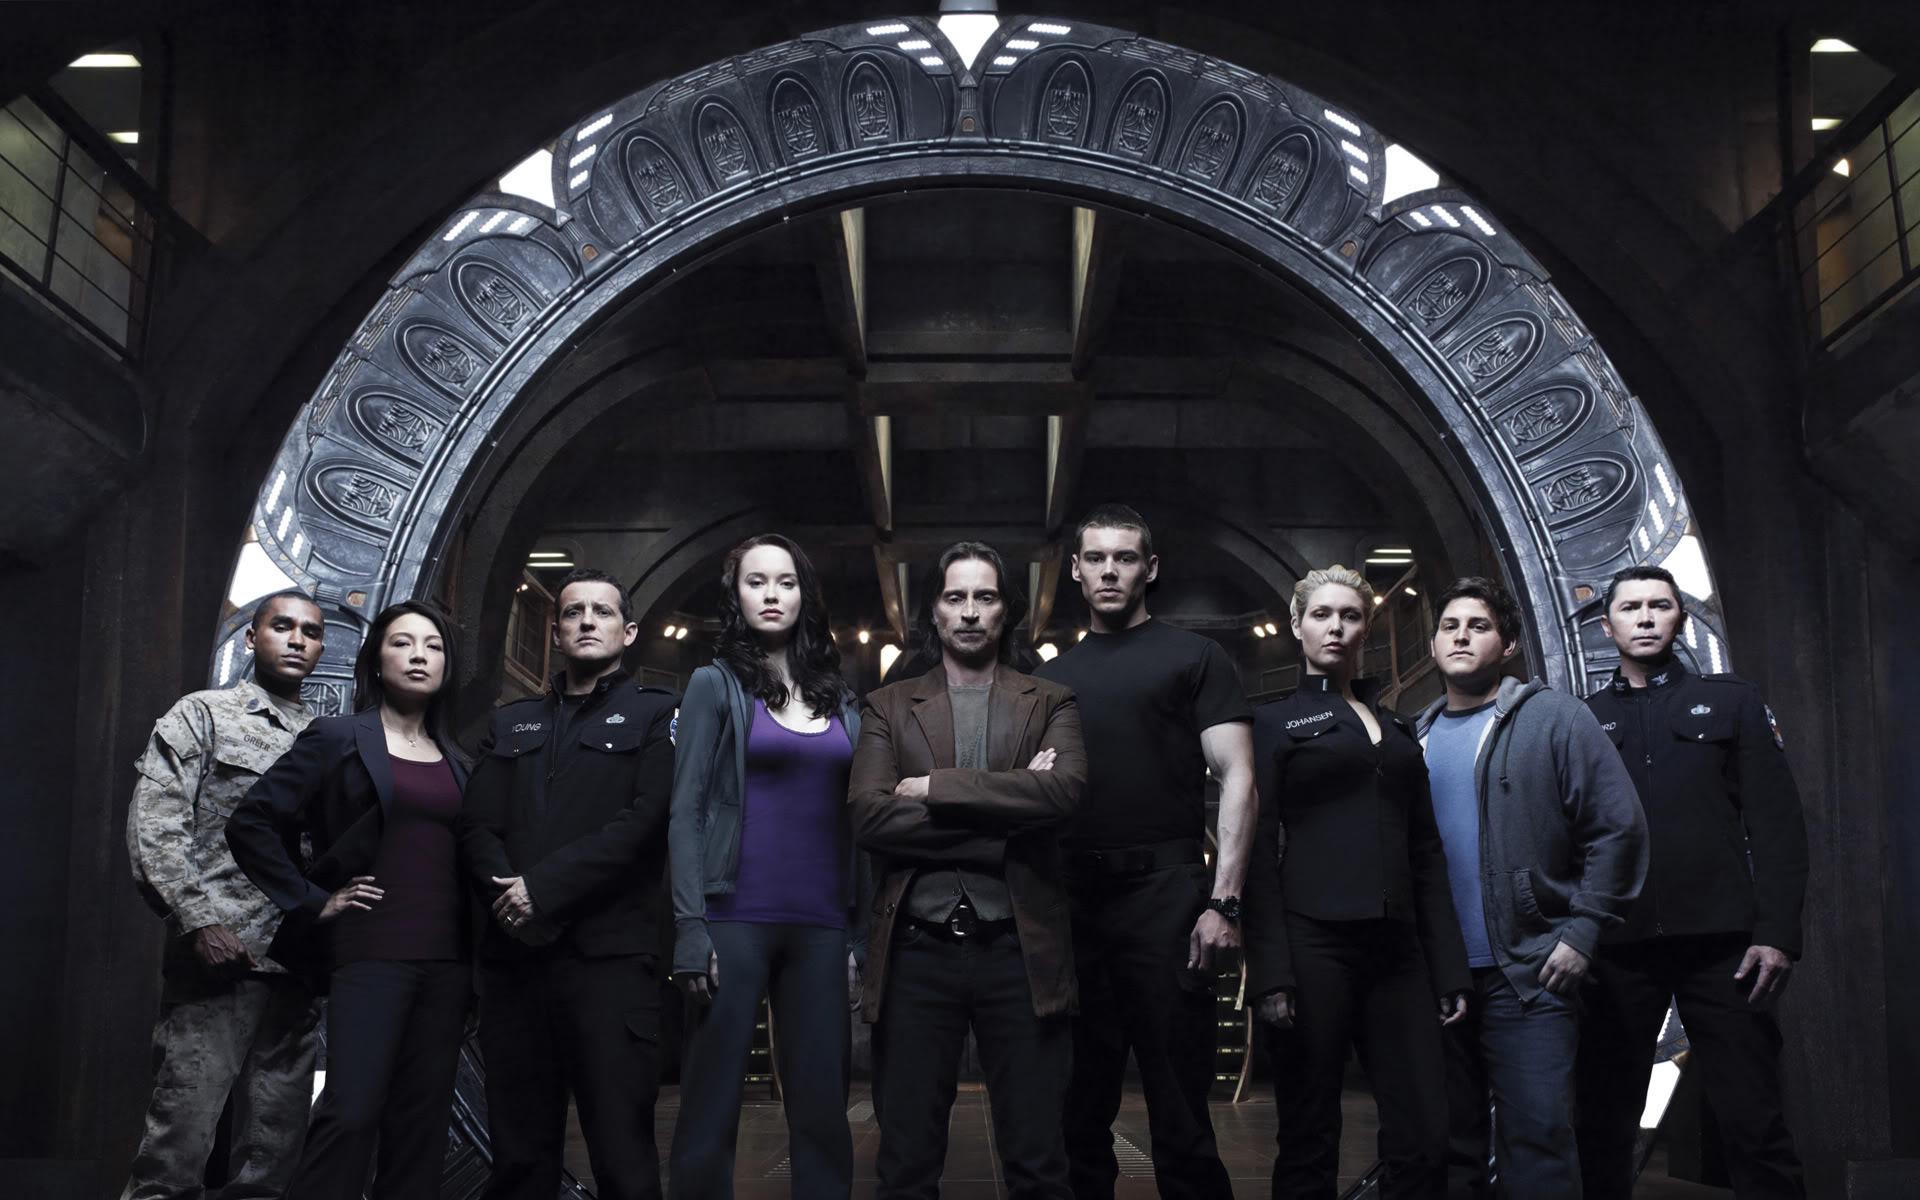 Stargate Petition Ted Sarandos Save Stargate Universe Changeorg